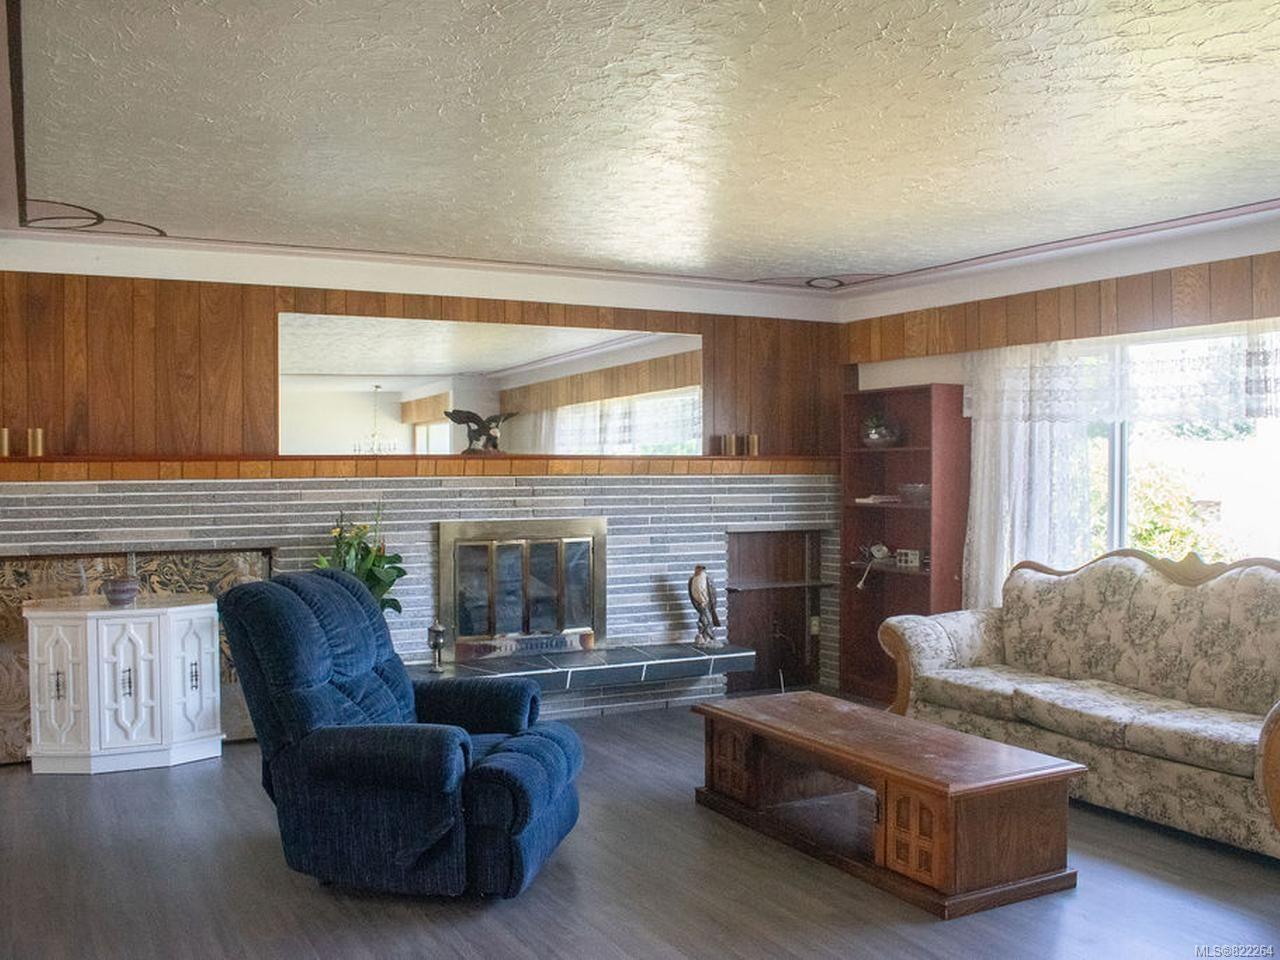 Photo 3: Photos: 4150 Rex Rd in PORT ALBERNI: PA Port Alberni House for sale (Port Alberni)  : MLS®# 822264